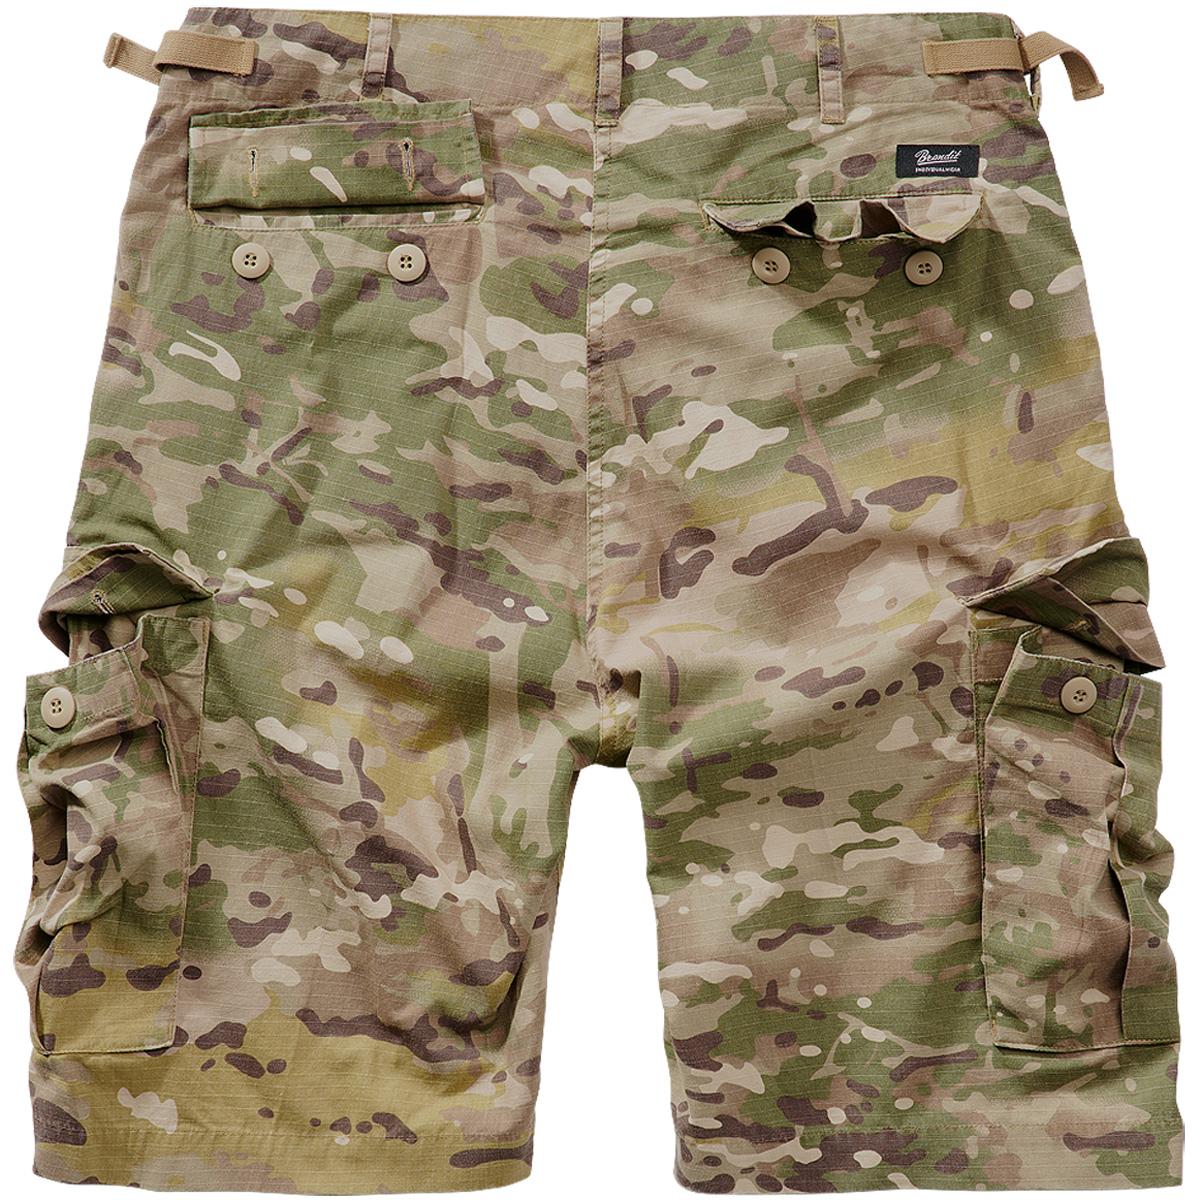 Brandit-BDU-Ripstop-Shorts-S-7XL-Army-Cargo-Bermuda-Outdoor-Short-kurze-Hose miniatura 17